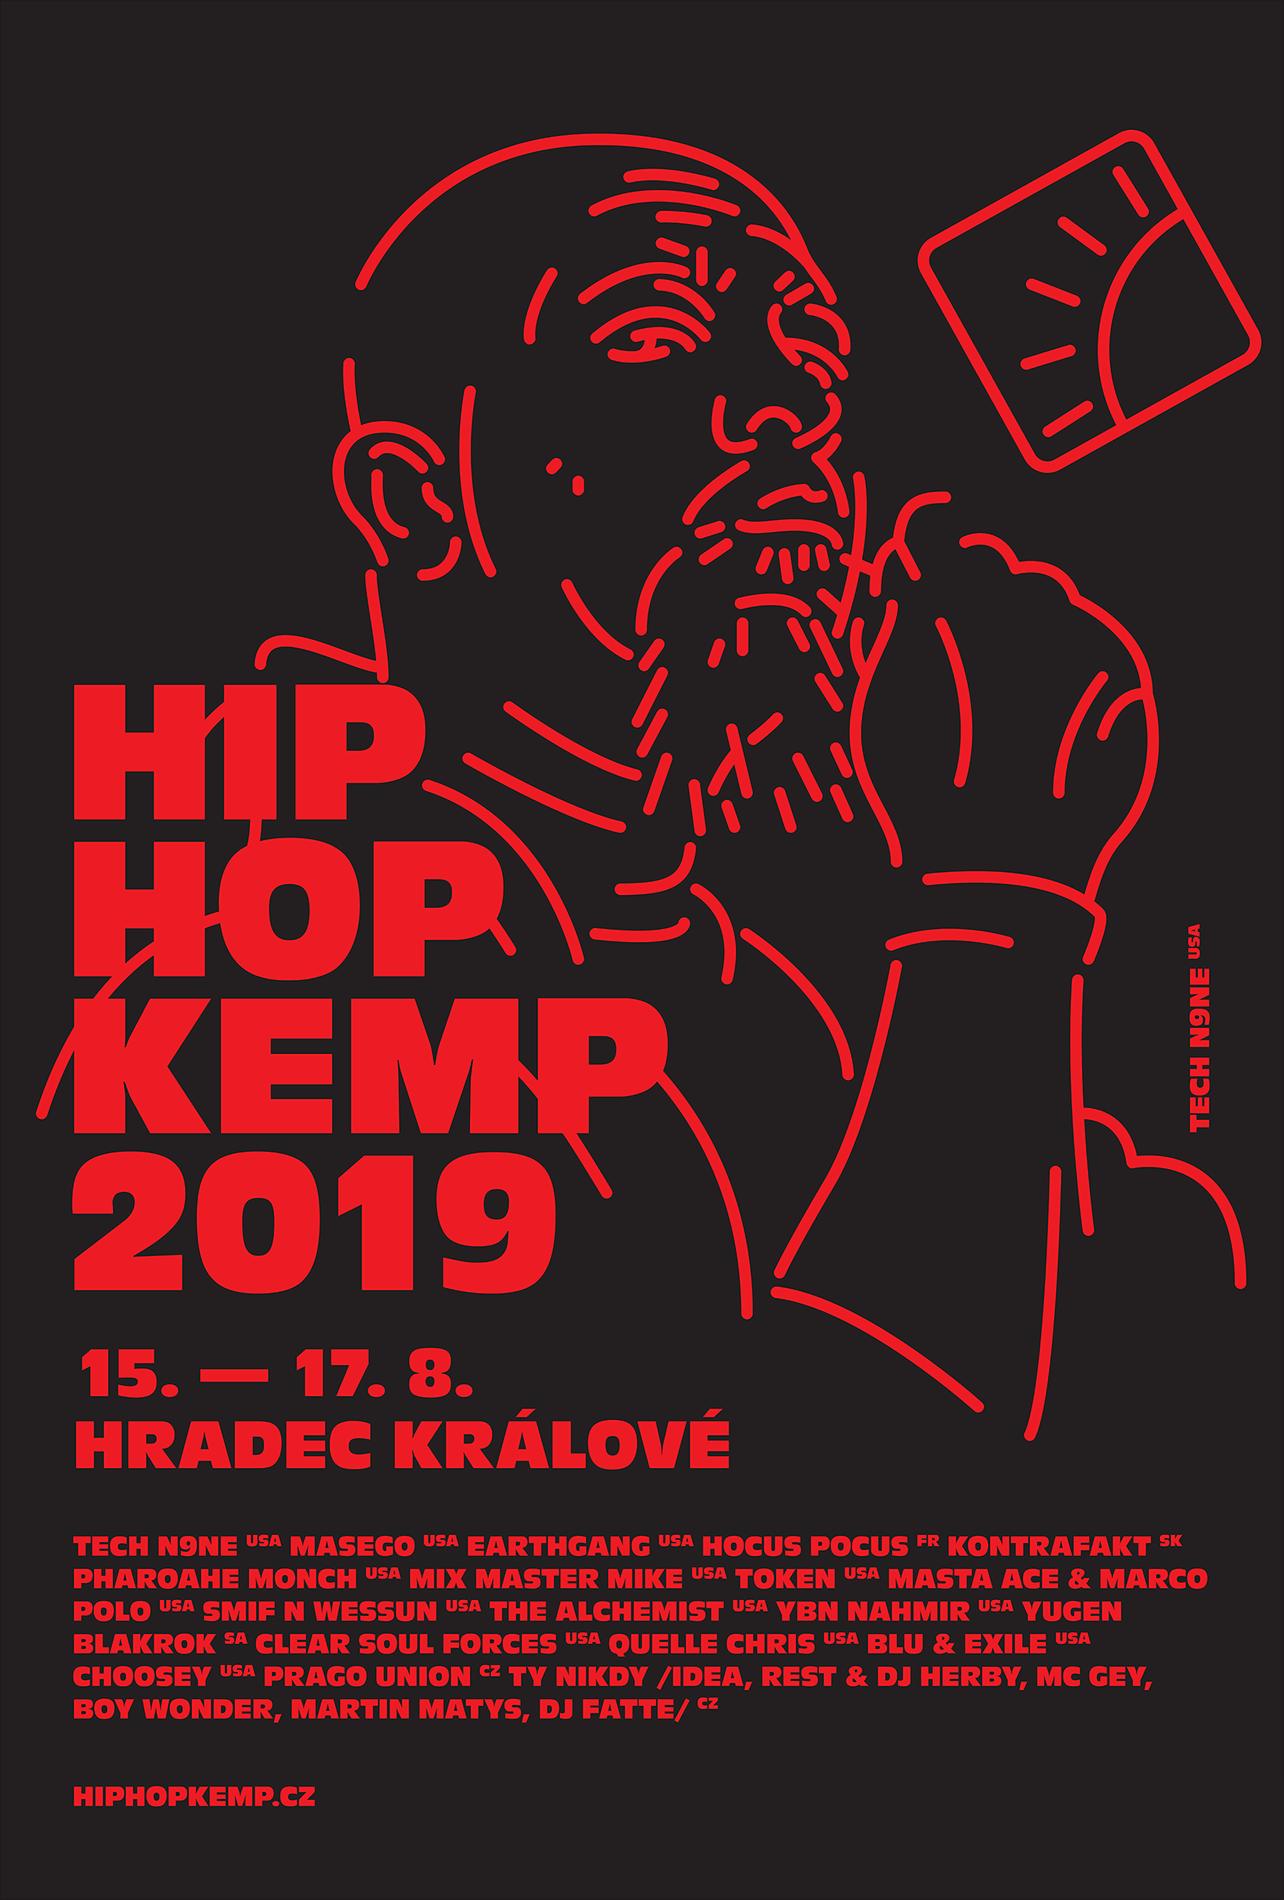 HIP HOP KEMP 2019